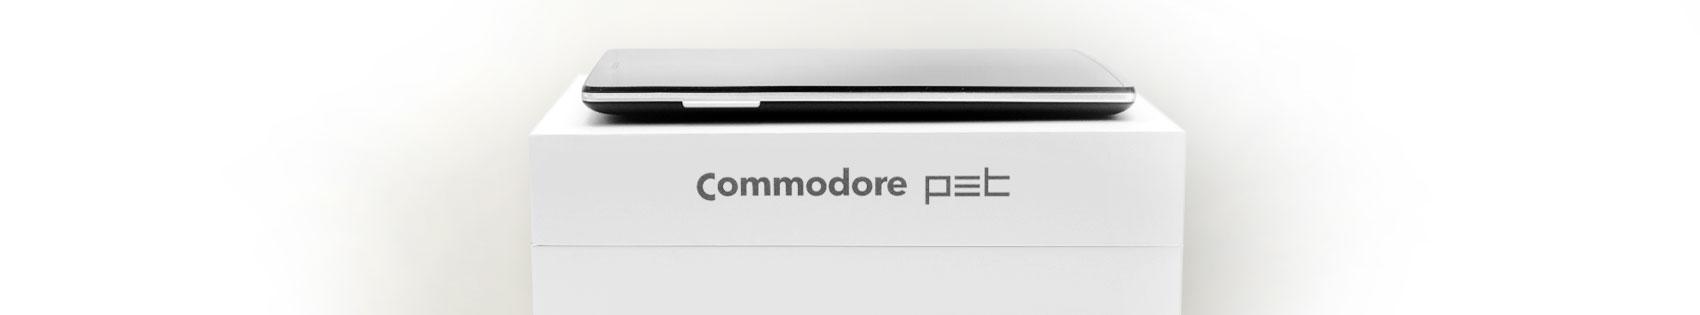 Commodore-PET-smartphone